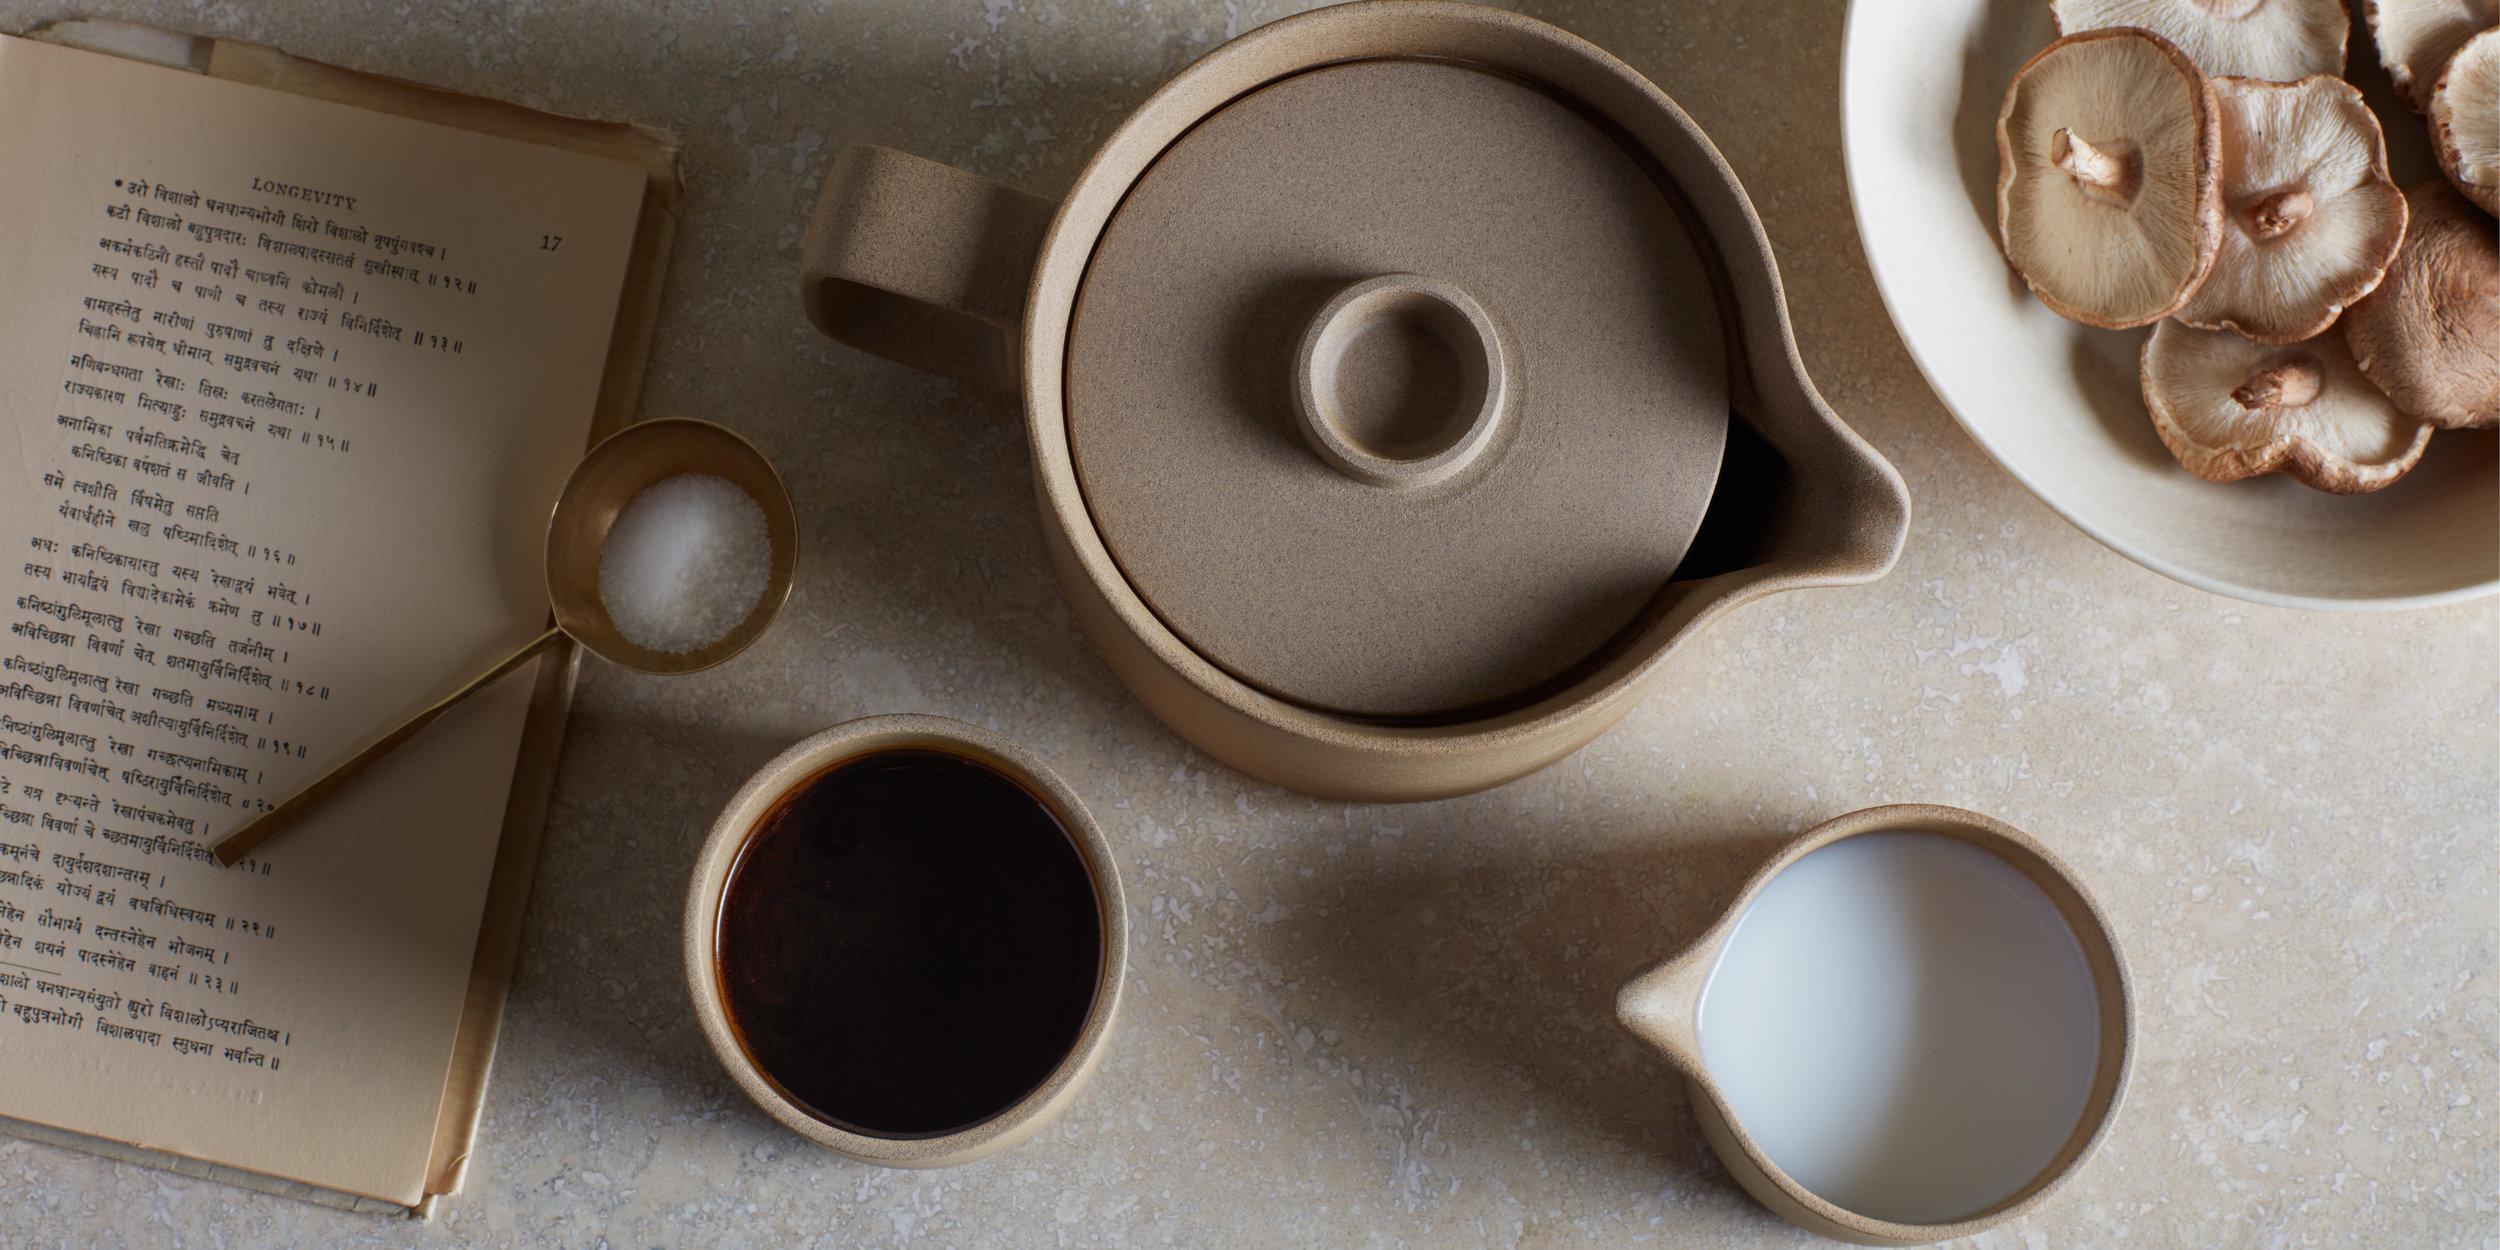 bt_banner_tea_and_tea_accessories_02.jpg